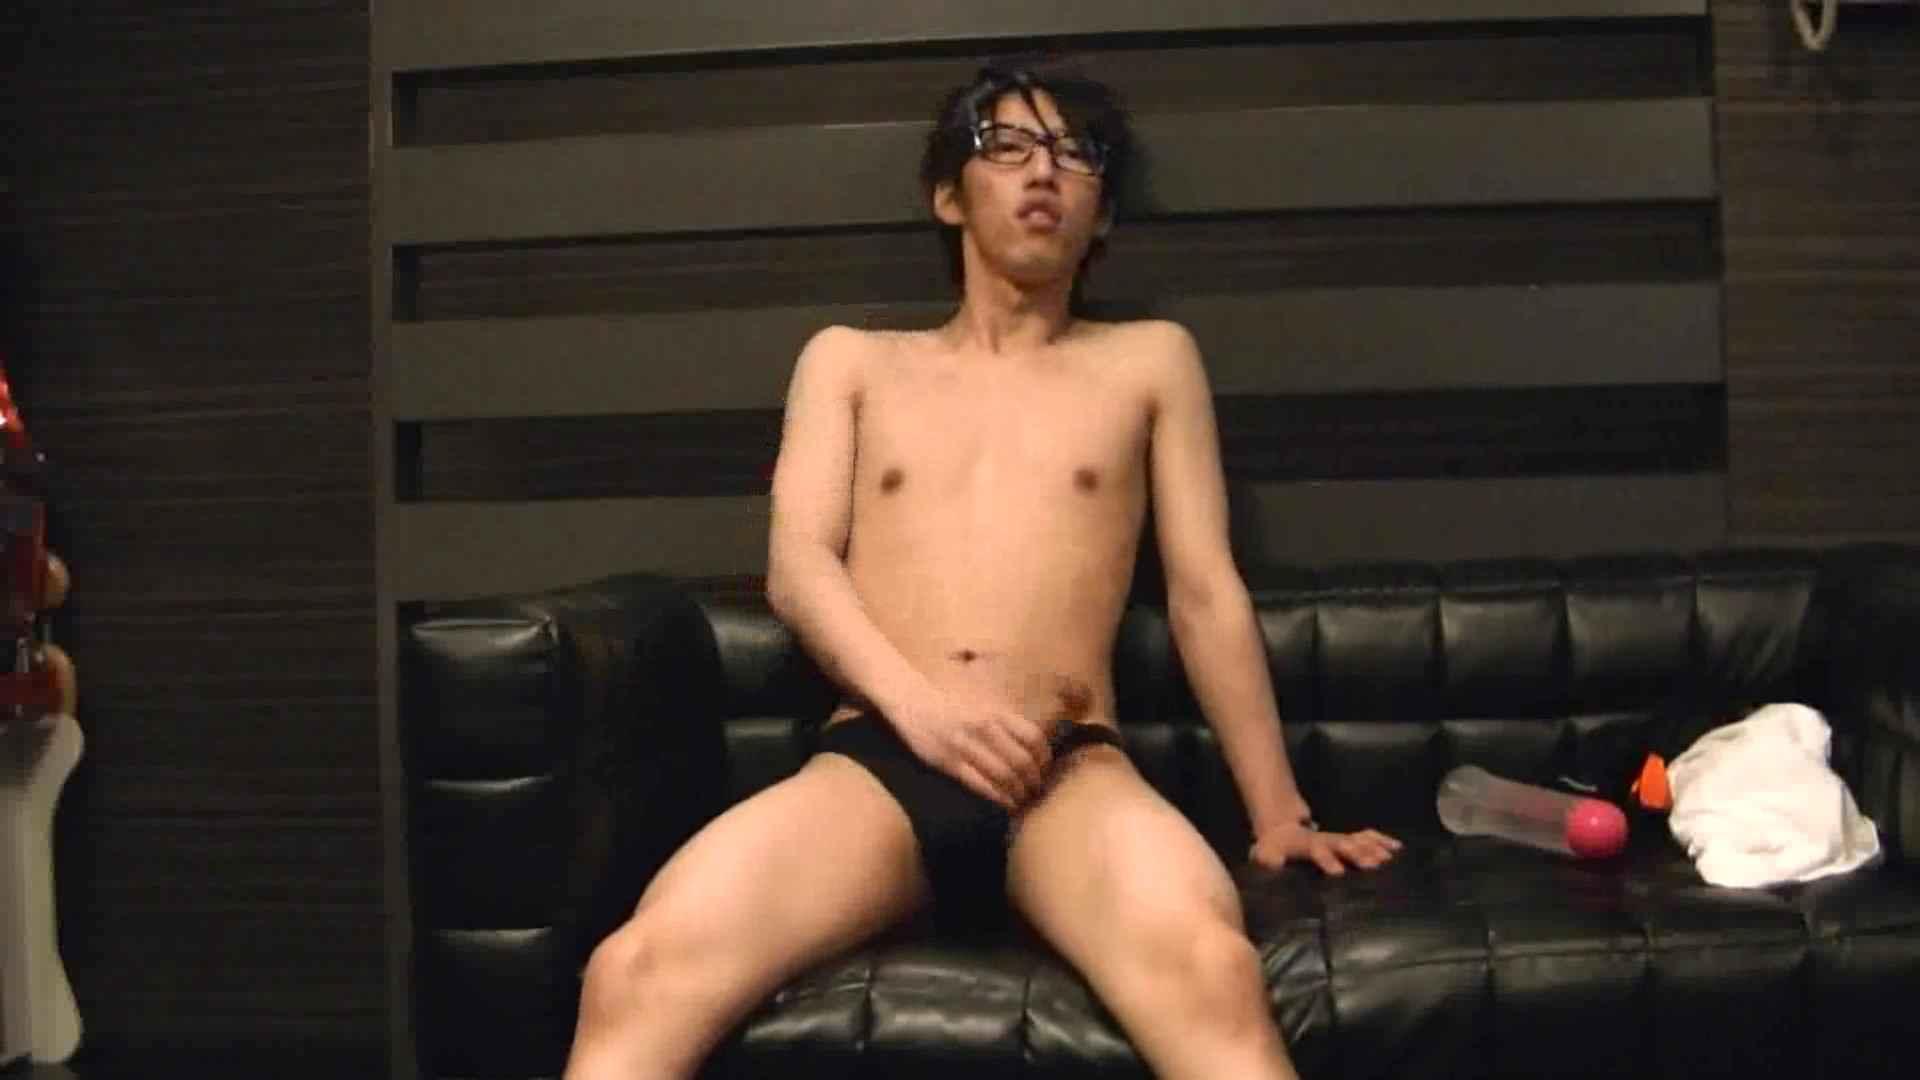 ONA見せカーニバル!! Vol3 男 ゲイ無料無修正画像 89枚 44